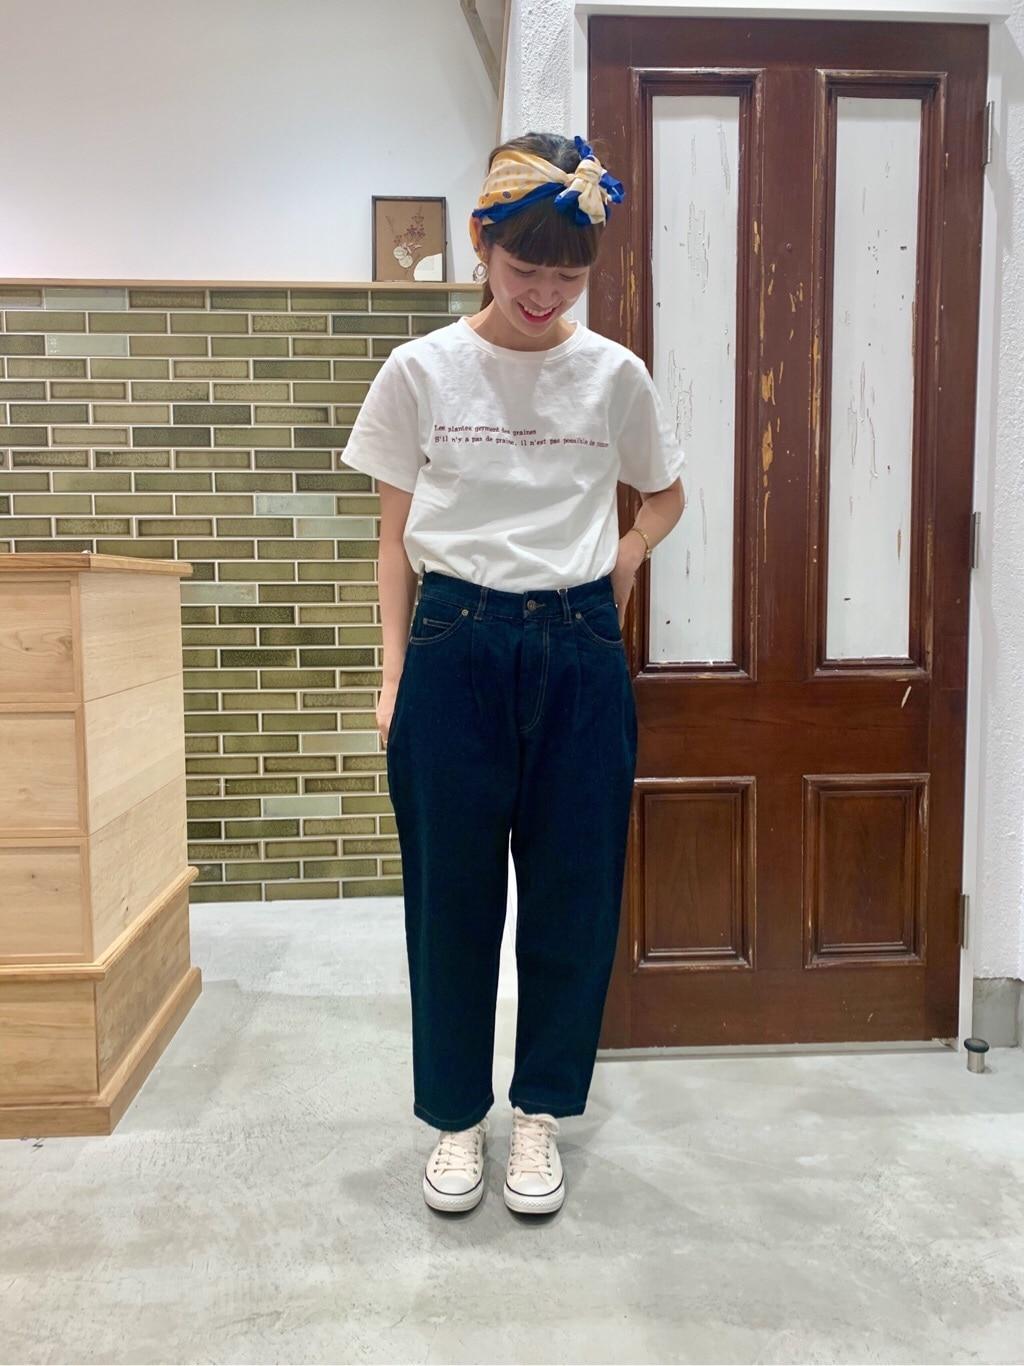 chambre de charme 横浜ジョイナス 身長:160cm 2020.04.11